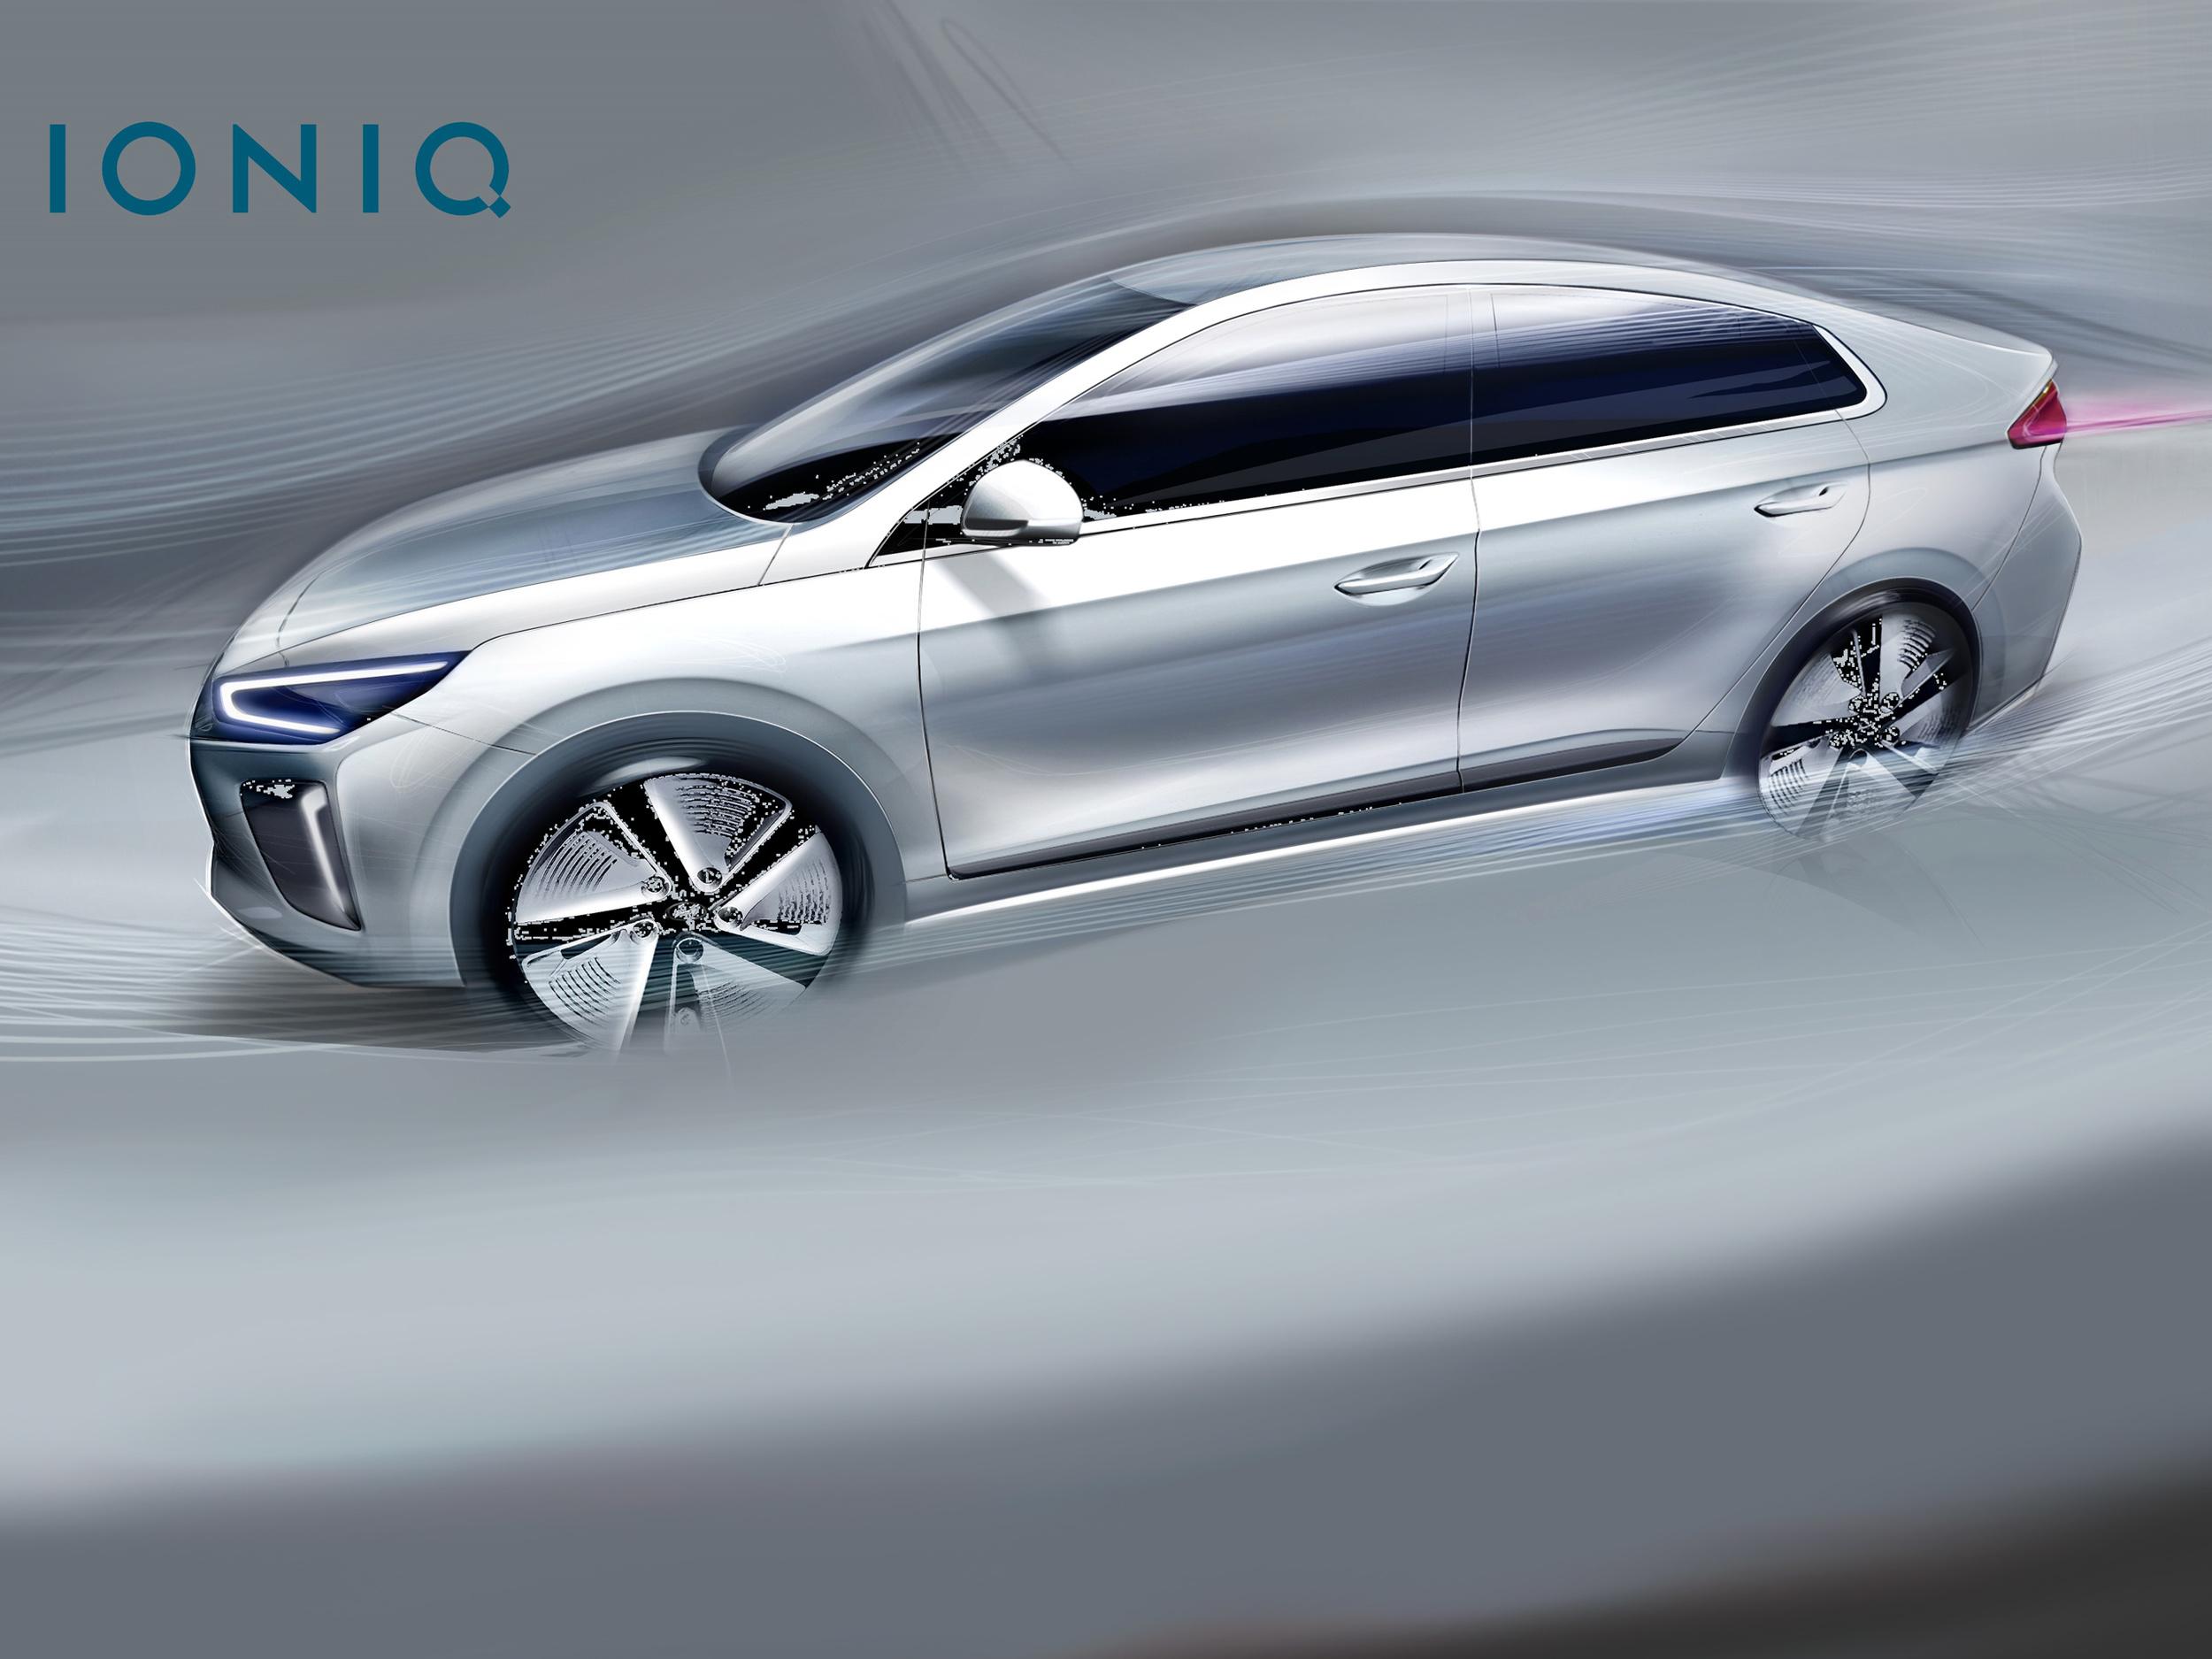 IONIQ-exterior-teaser.jpg